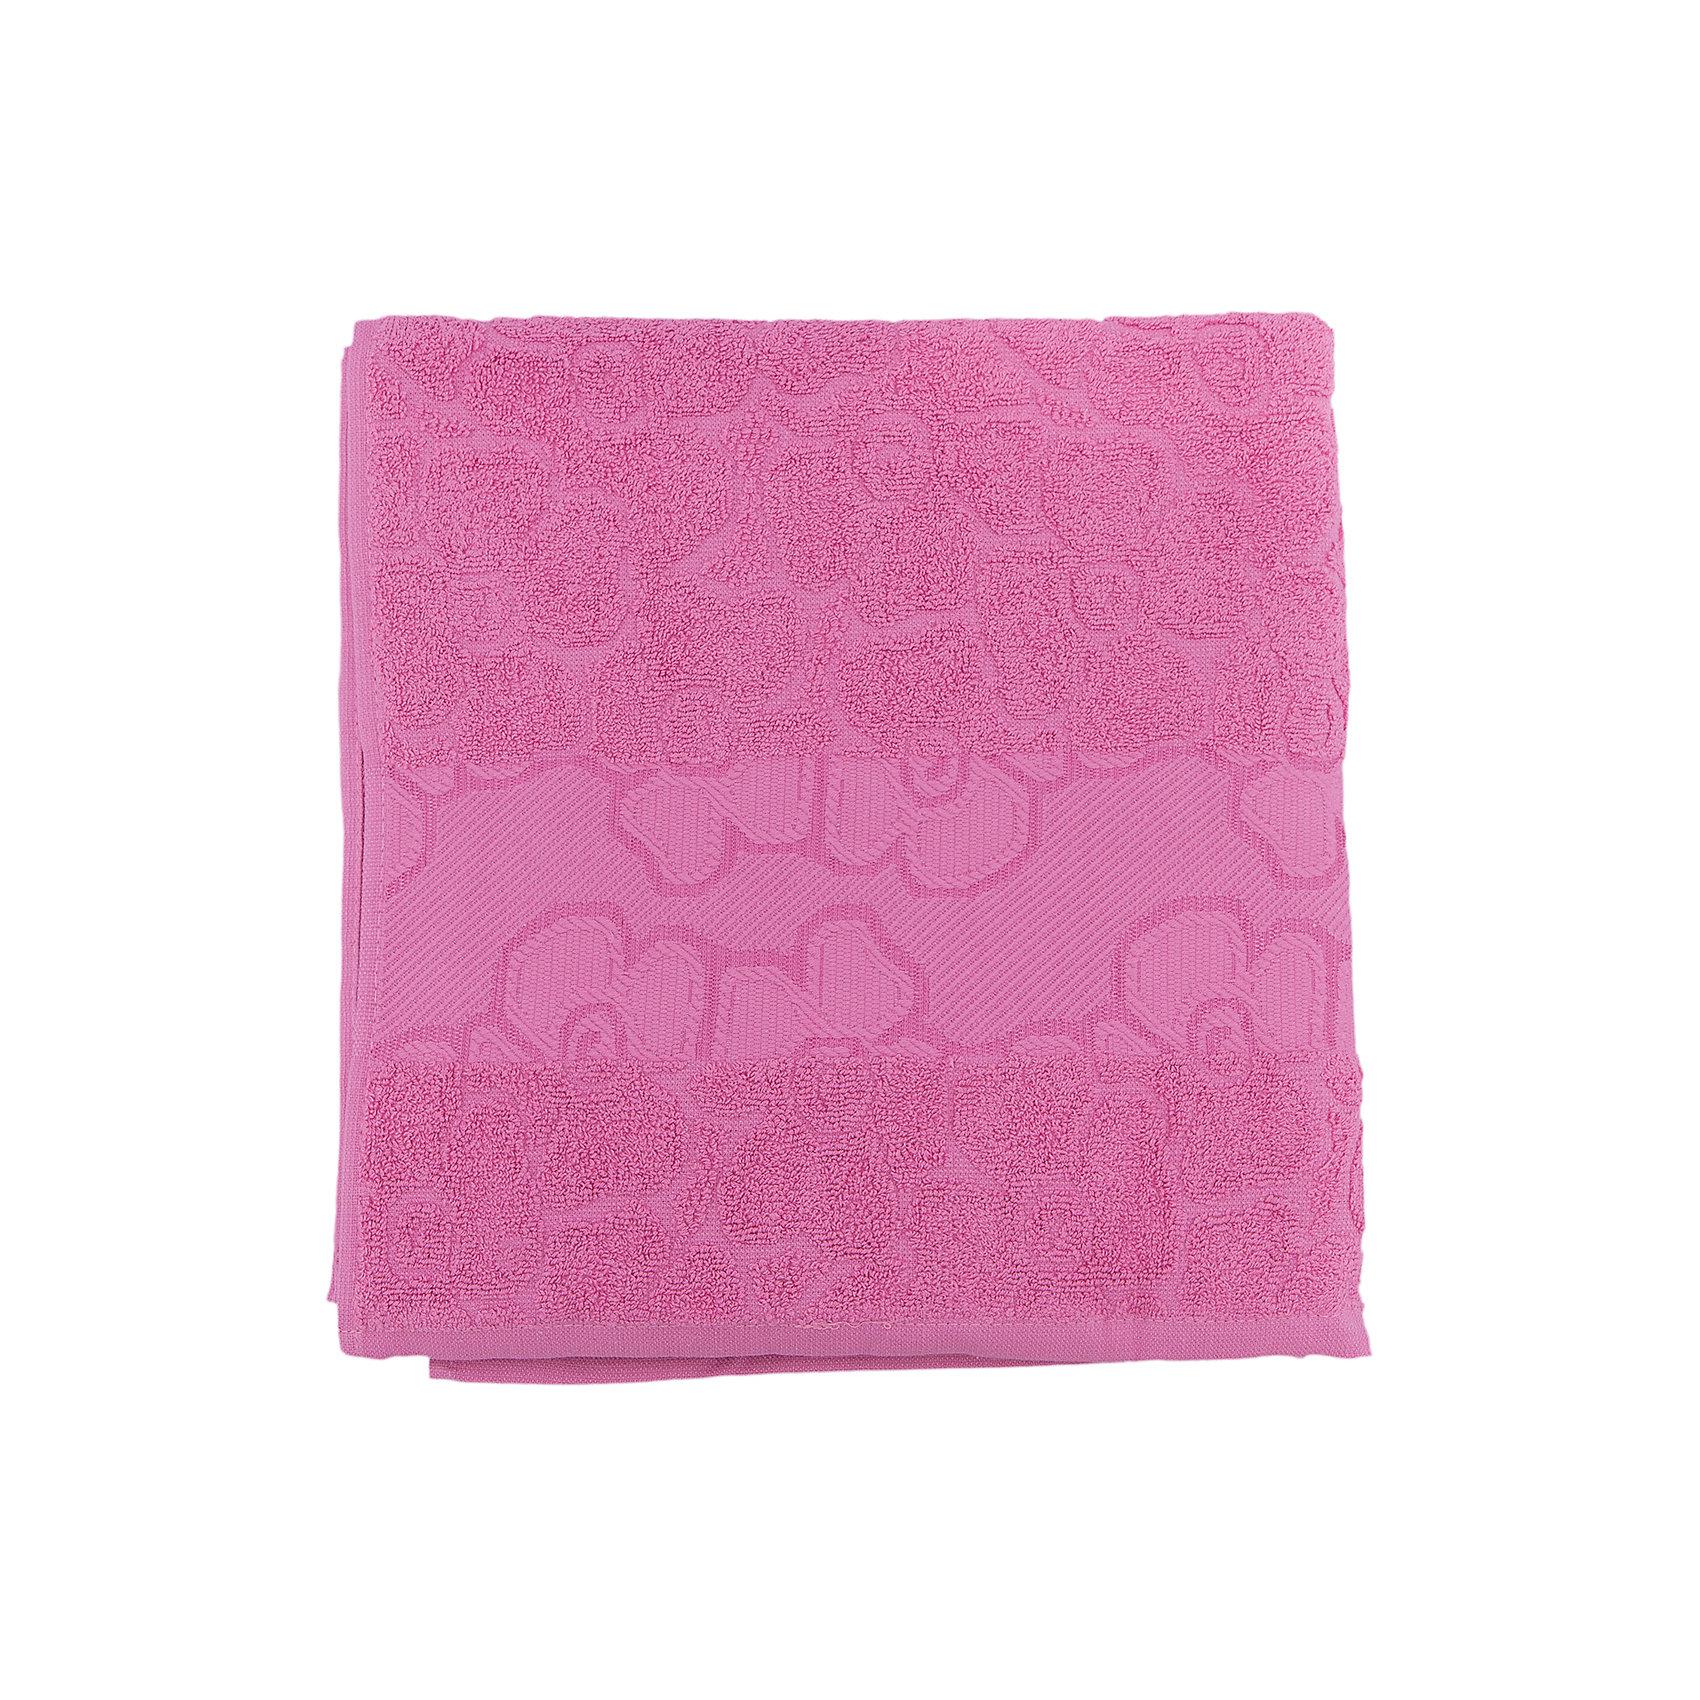 Португалия Полотенце махровое Viola 70*140, Португалия, розовый полотенце махровое 70 140 см авангард